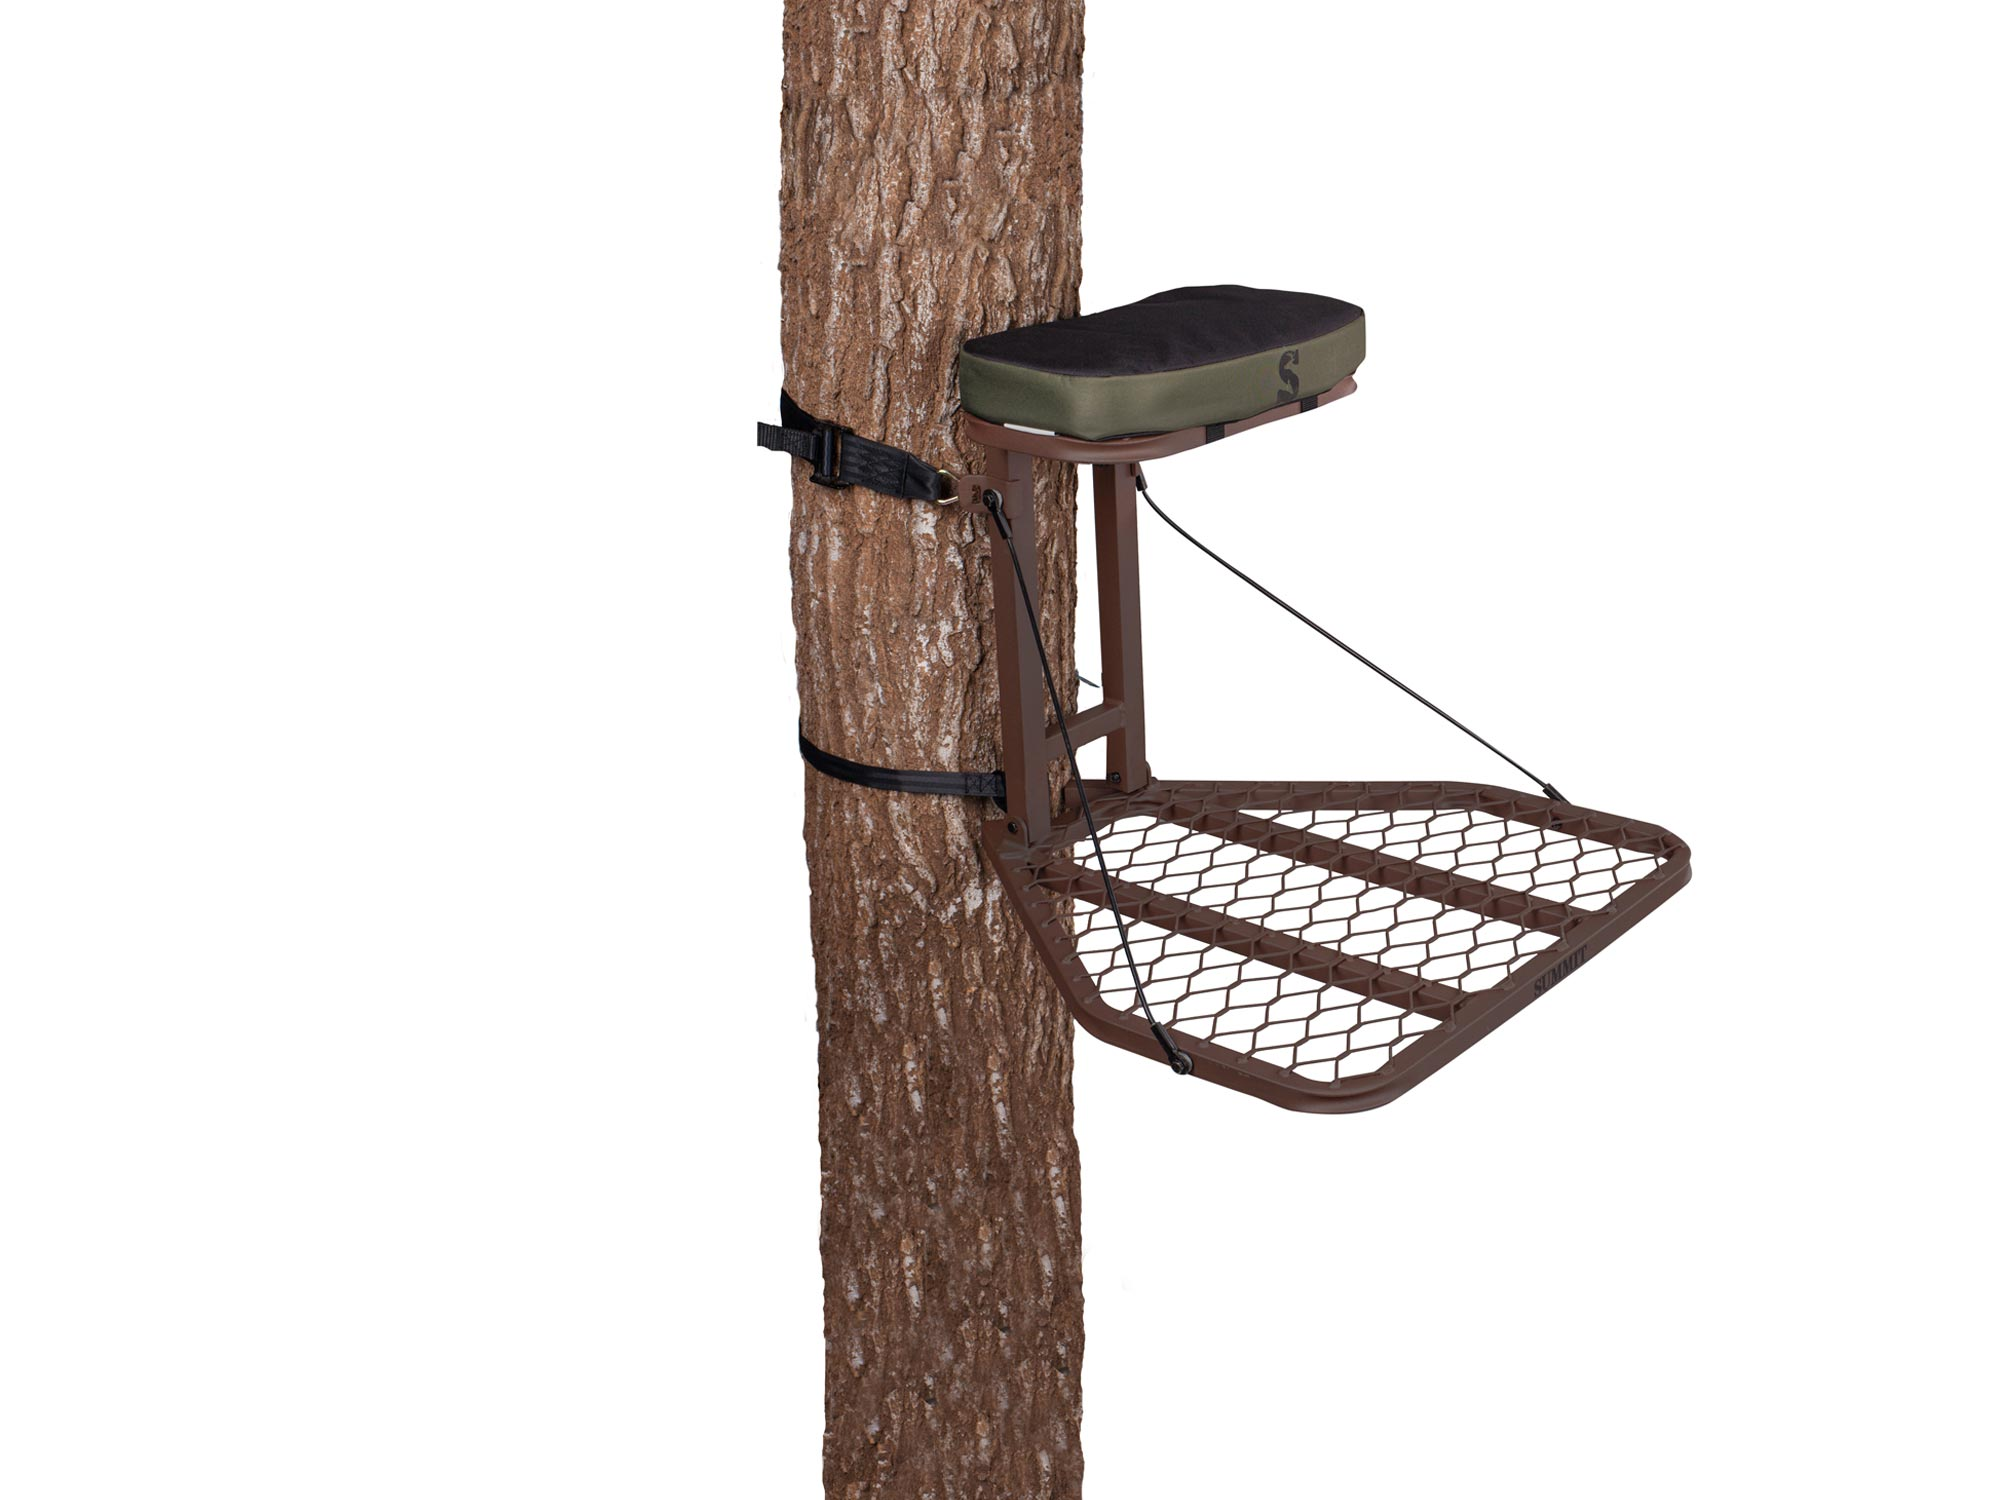 Summit Stoop Hang-on Treestand